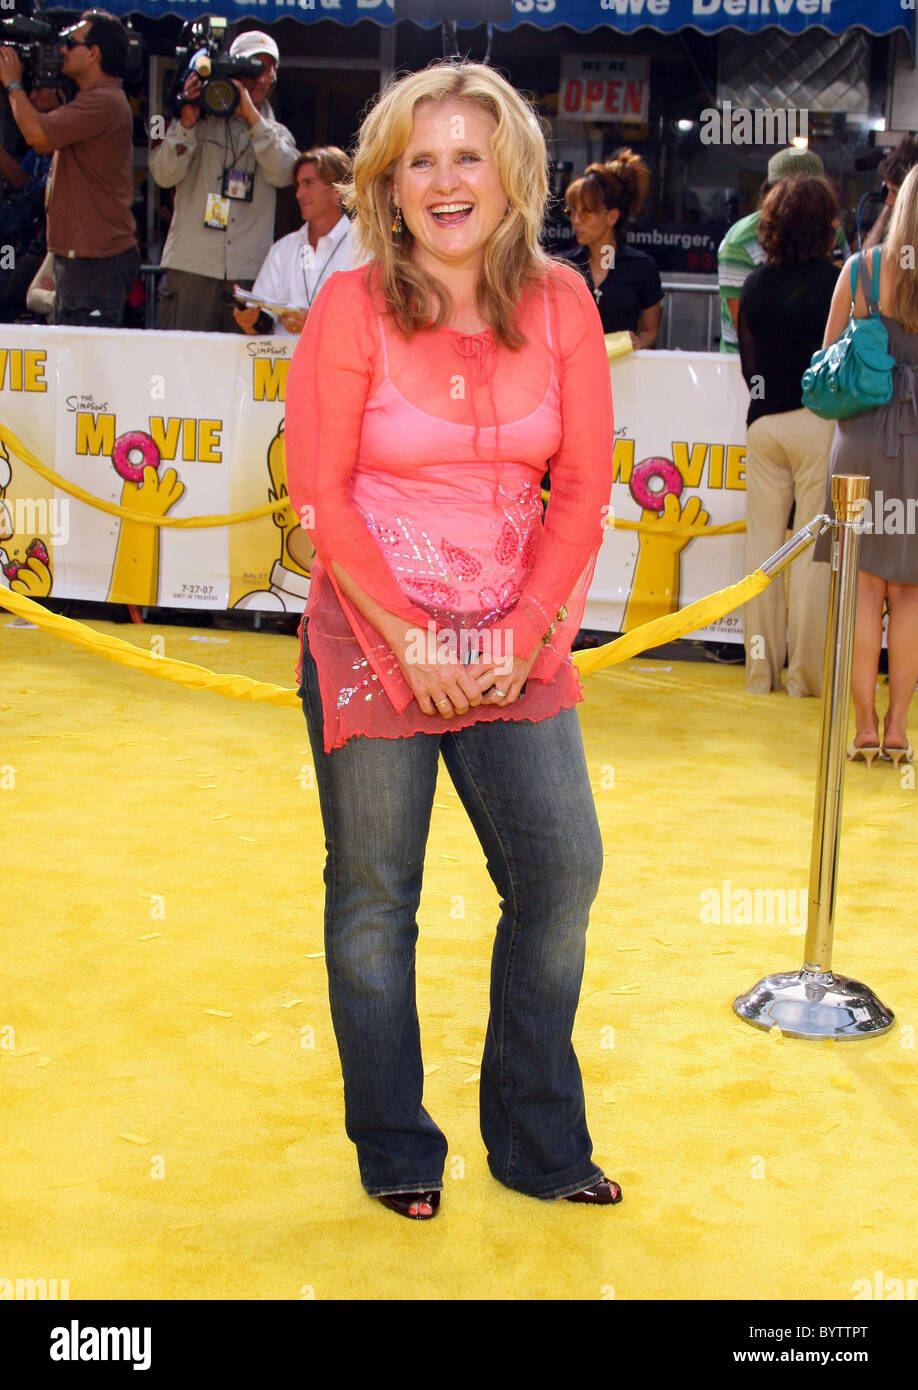 Nancy Cartwright Voice Of Bart Simpson The Simpsons Movie Stock Photo Alamy